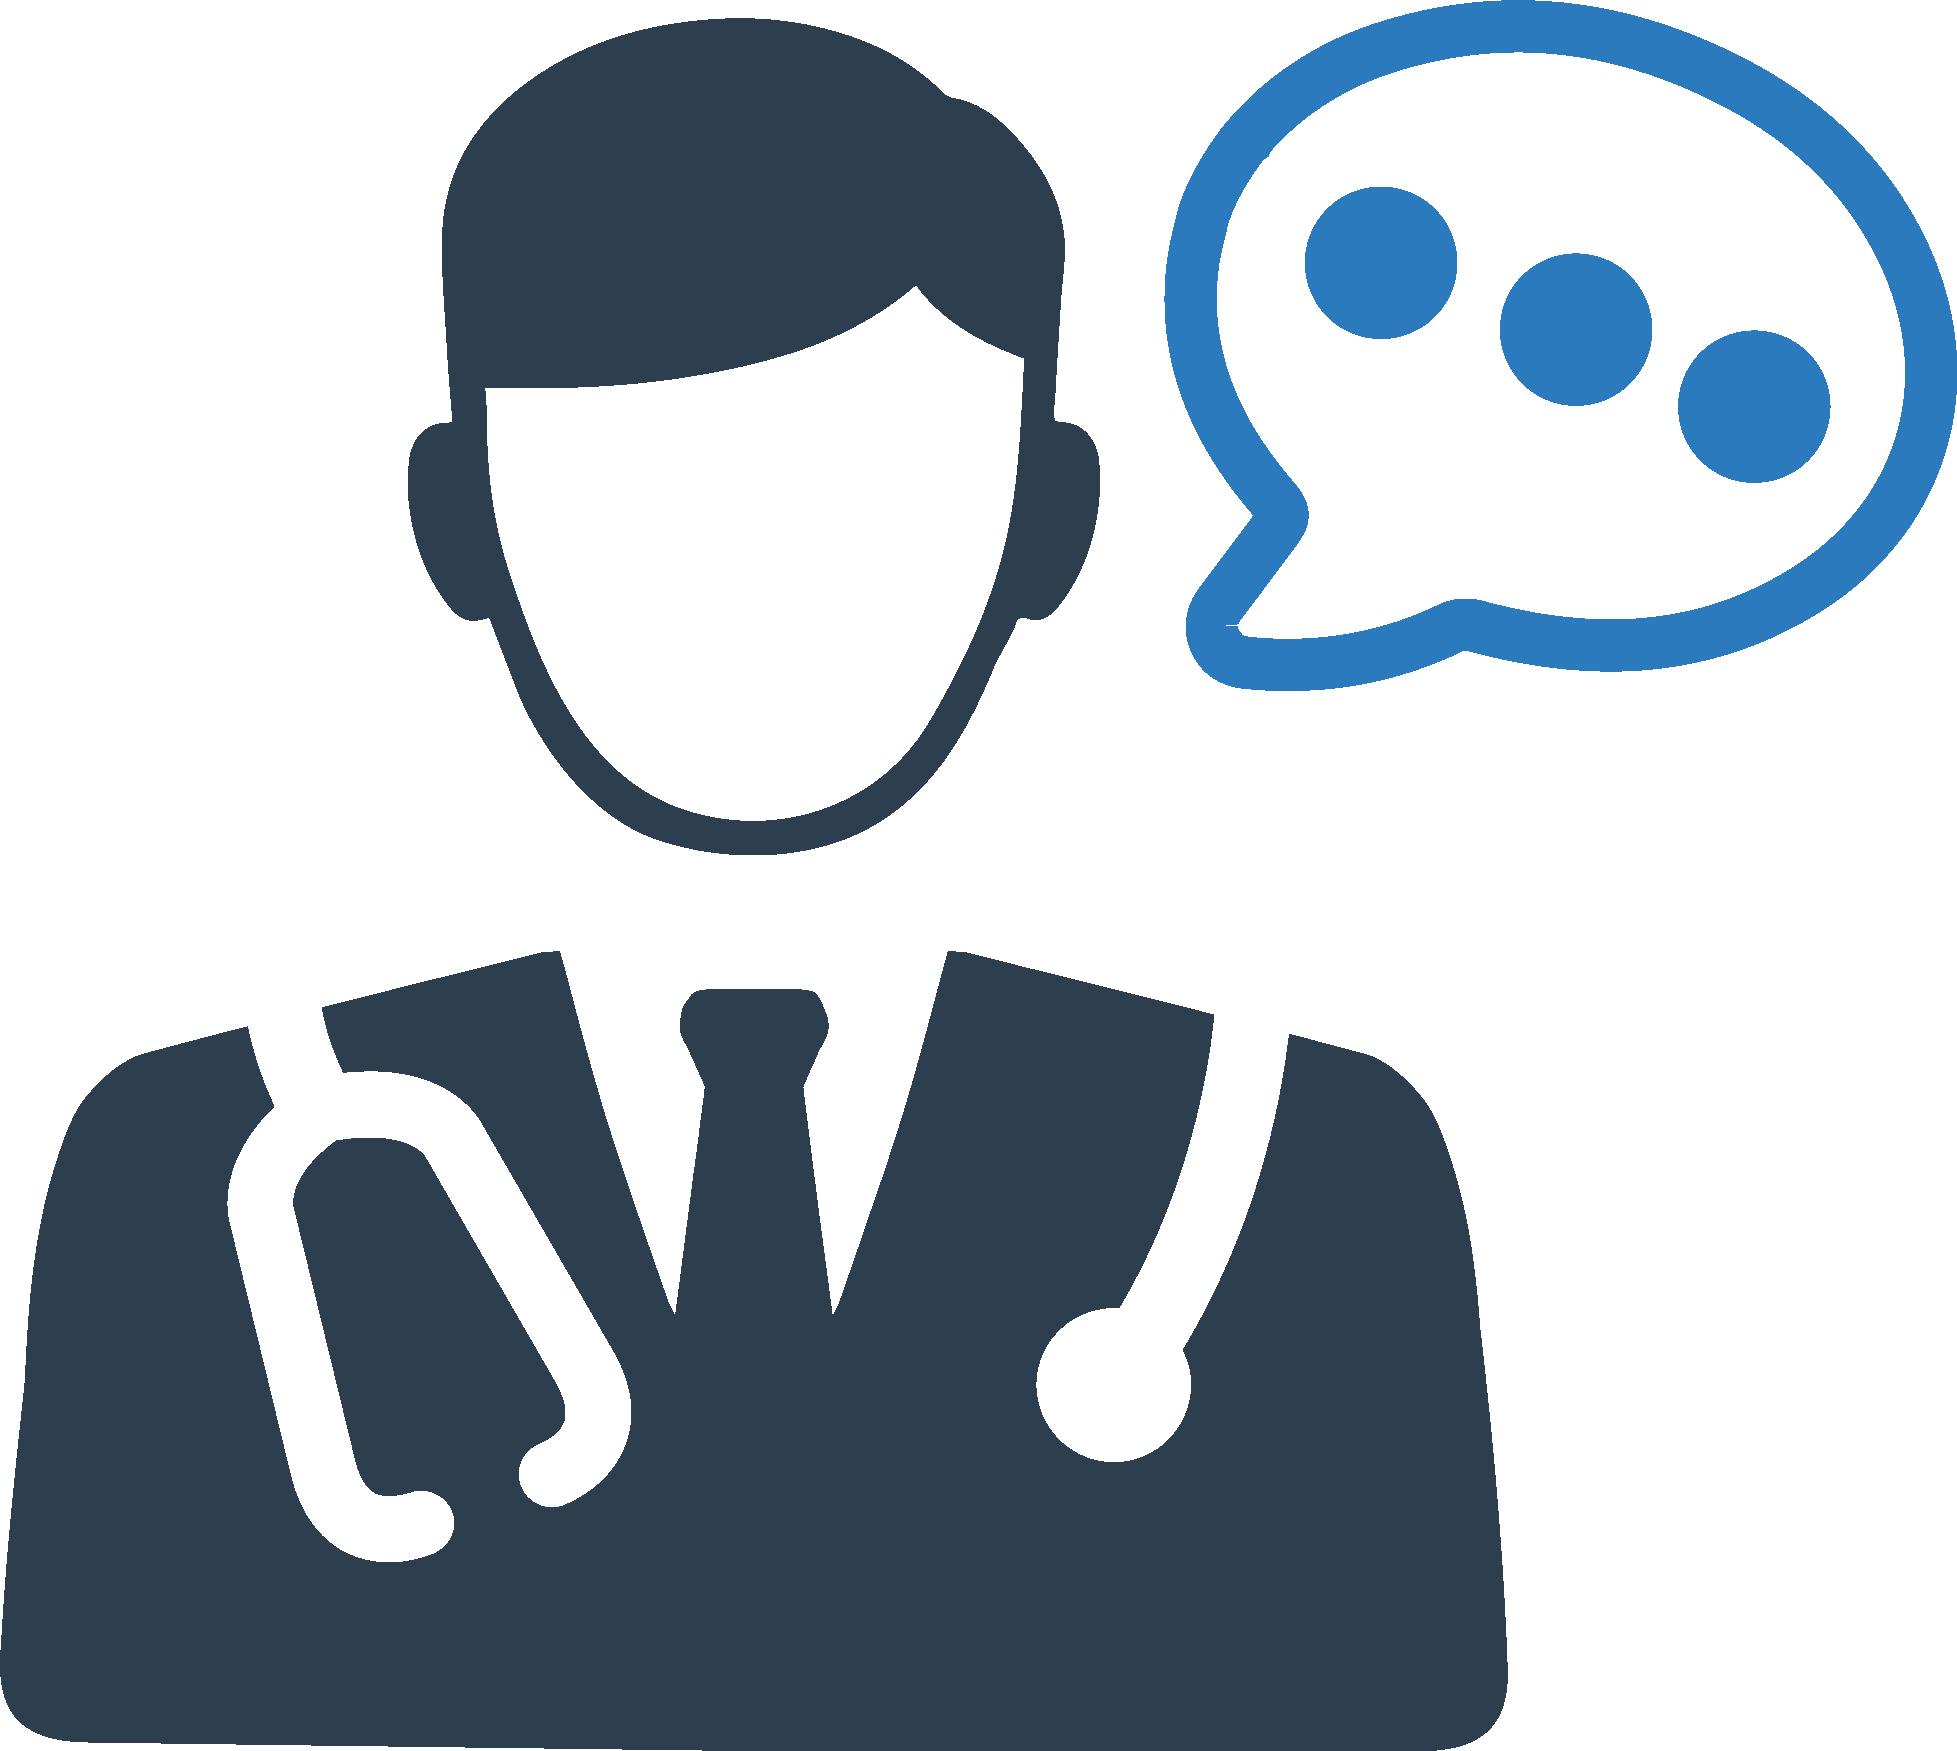 Hex-Logo-01.png